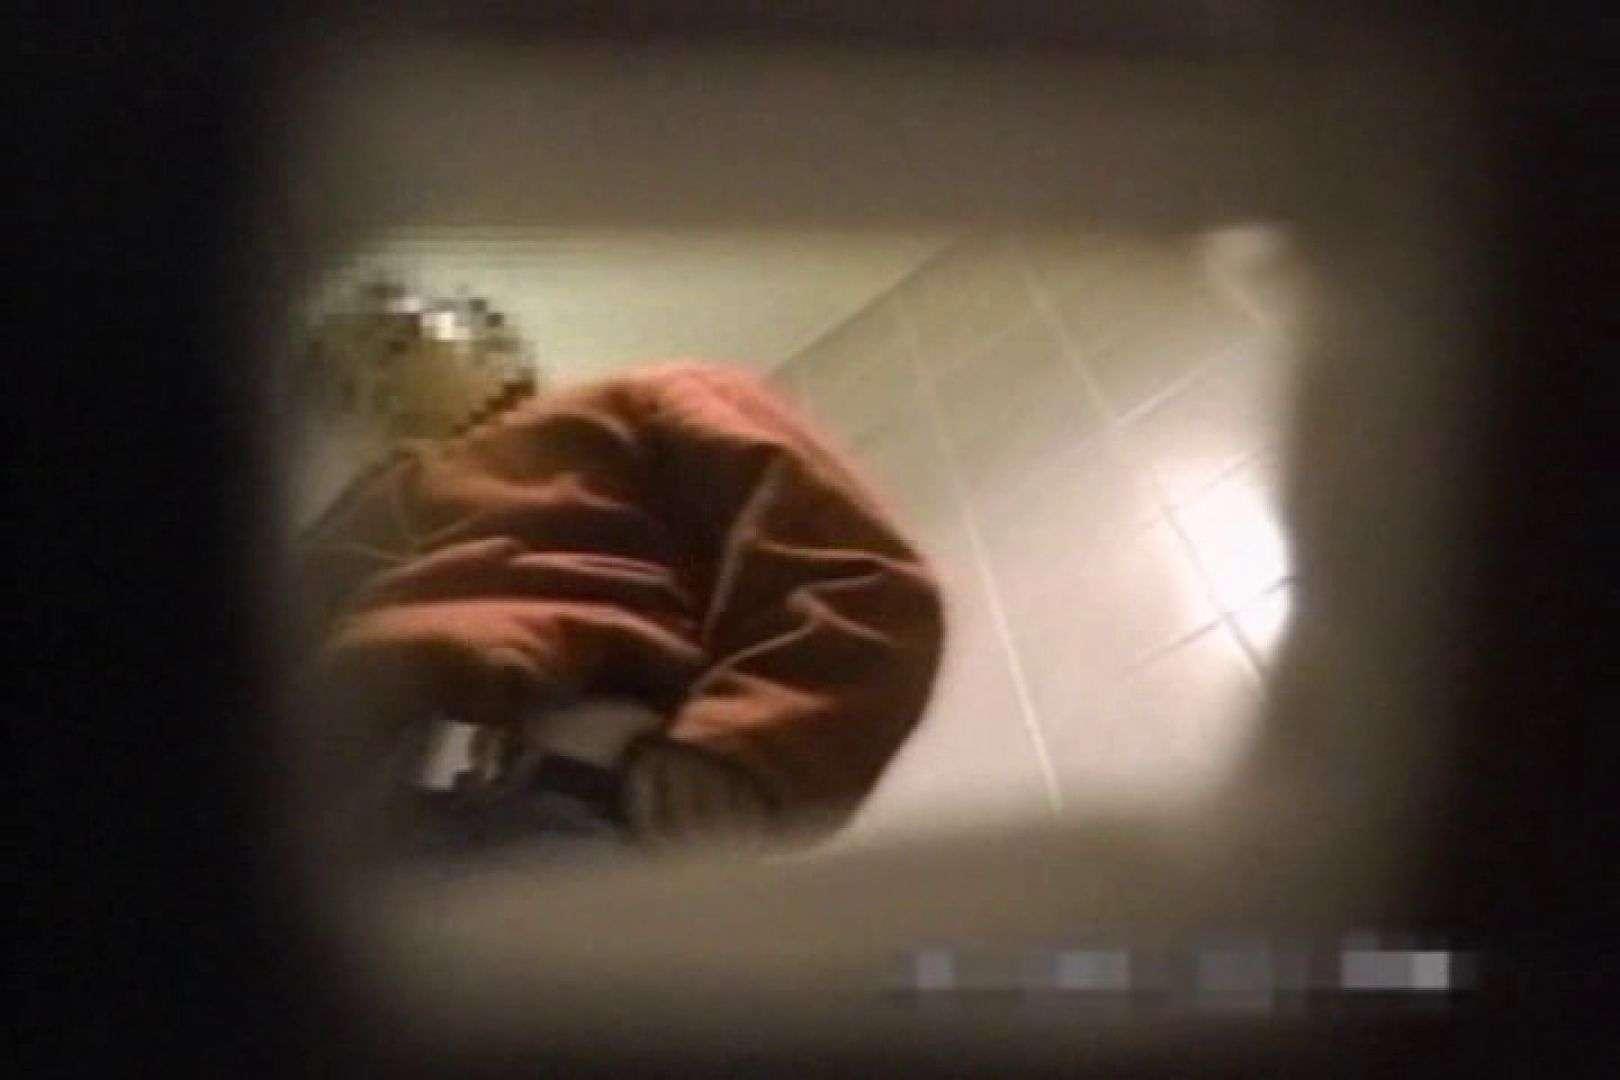 STY-013 実録!2カメde女子洗面所 名作 のぞき動画画像 52連発 14